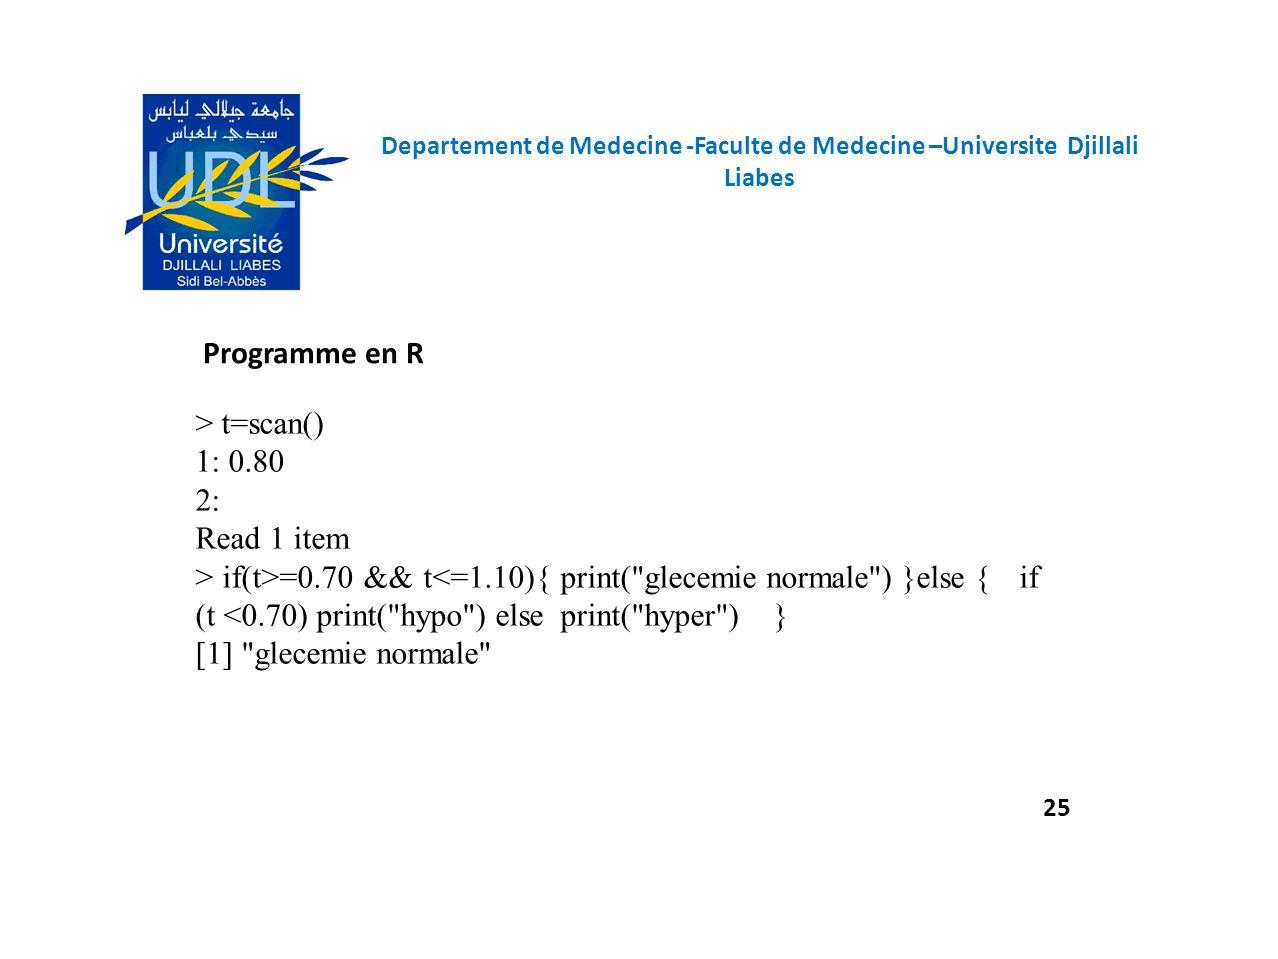 Programme en R 25 Departement de Medecine -Faculte de Medecine –Universite Djillali Liabes > t=scan() 1: 0.80 2: Read 1 item > if(t>=0.70 && t<=1.10){